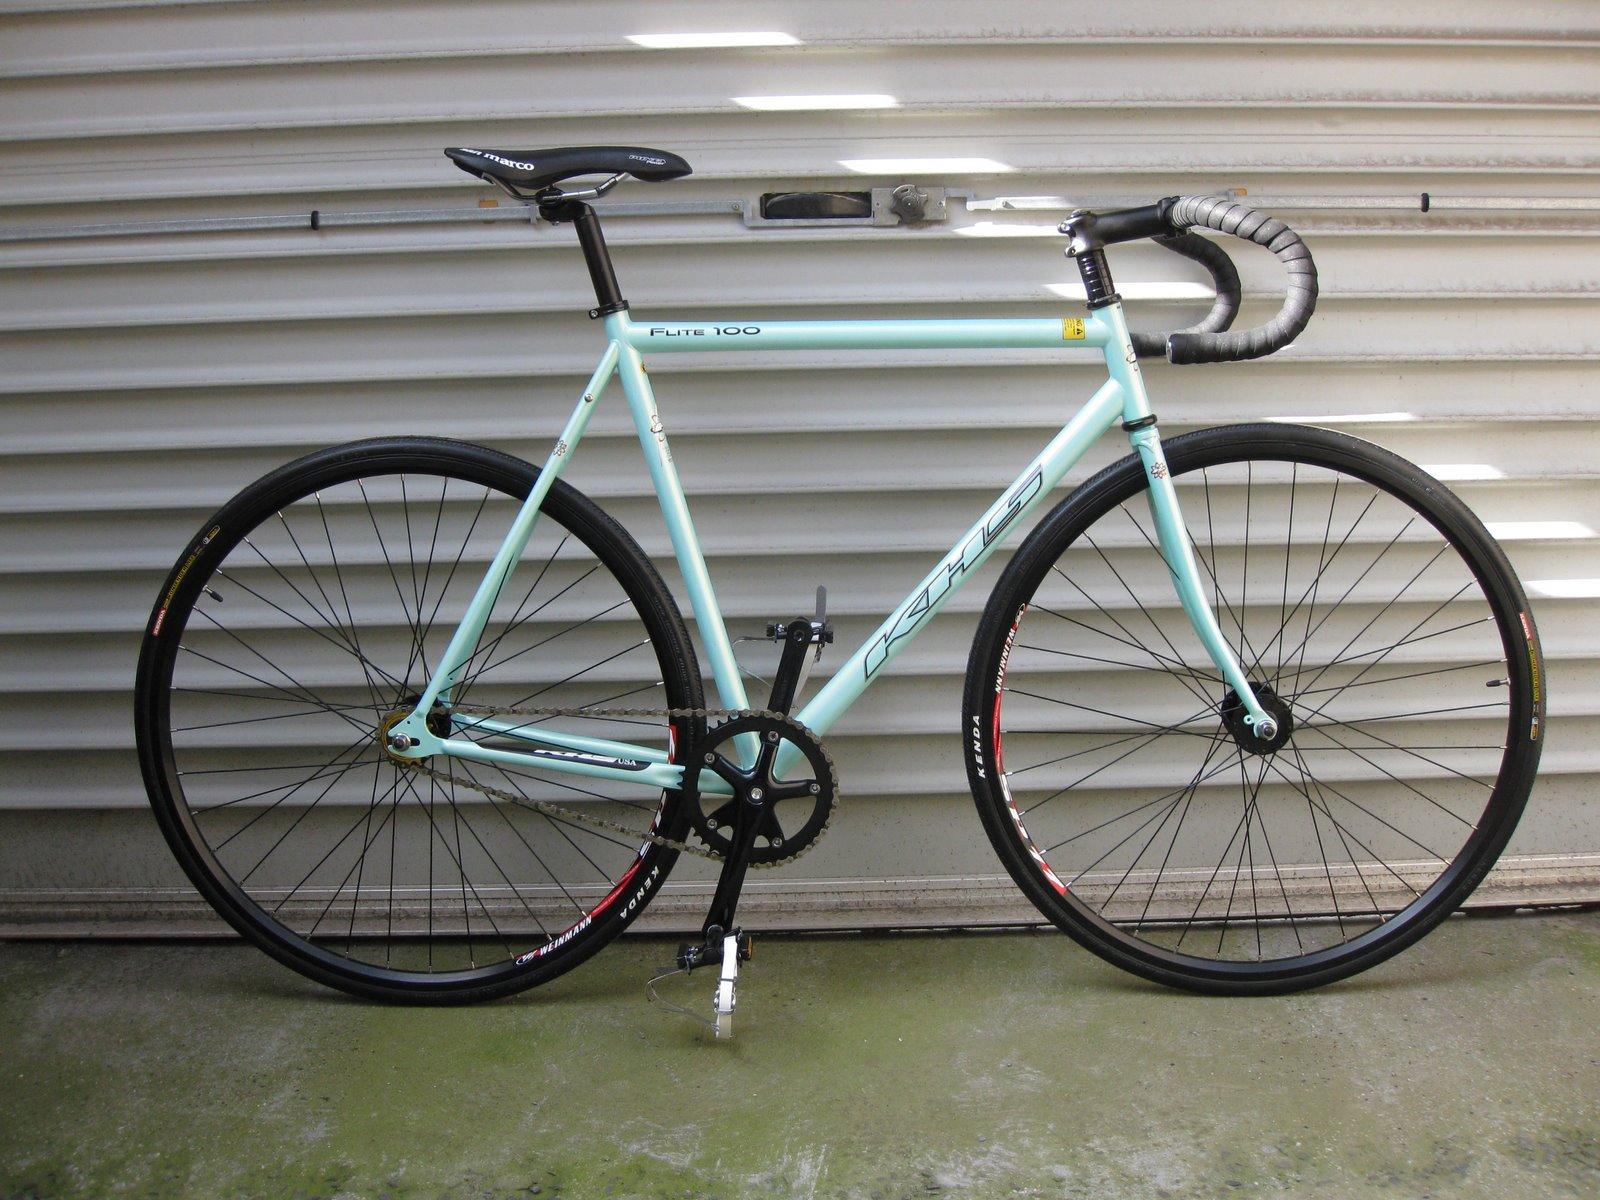 girl bike Shared from Wallpaper Fixie Bike Modification